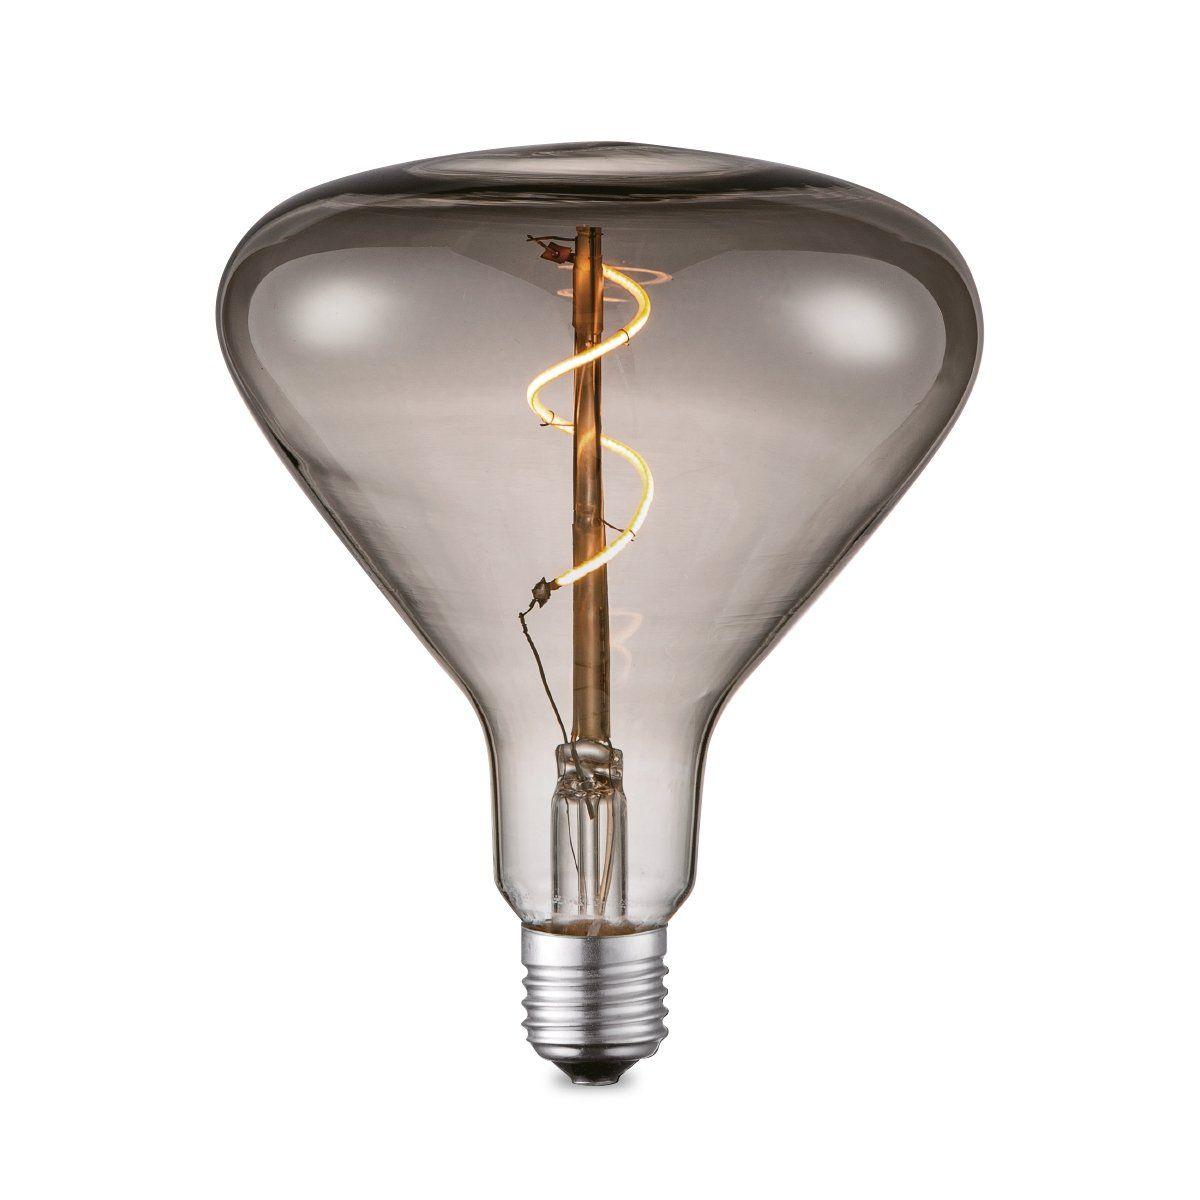 Home sweet home LED lamp Flex E27 3W 90Lm 2200K dimbaar - smoke